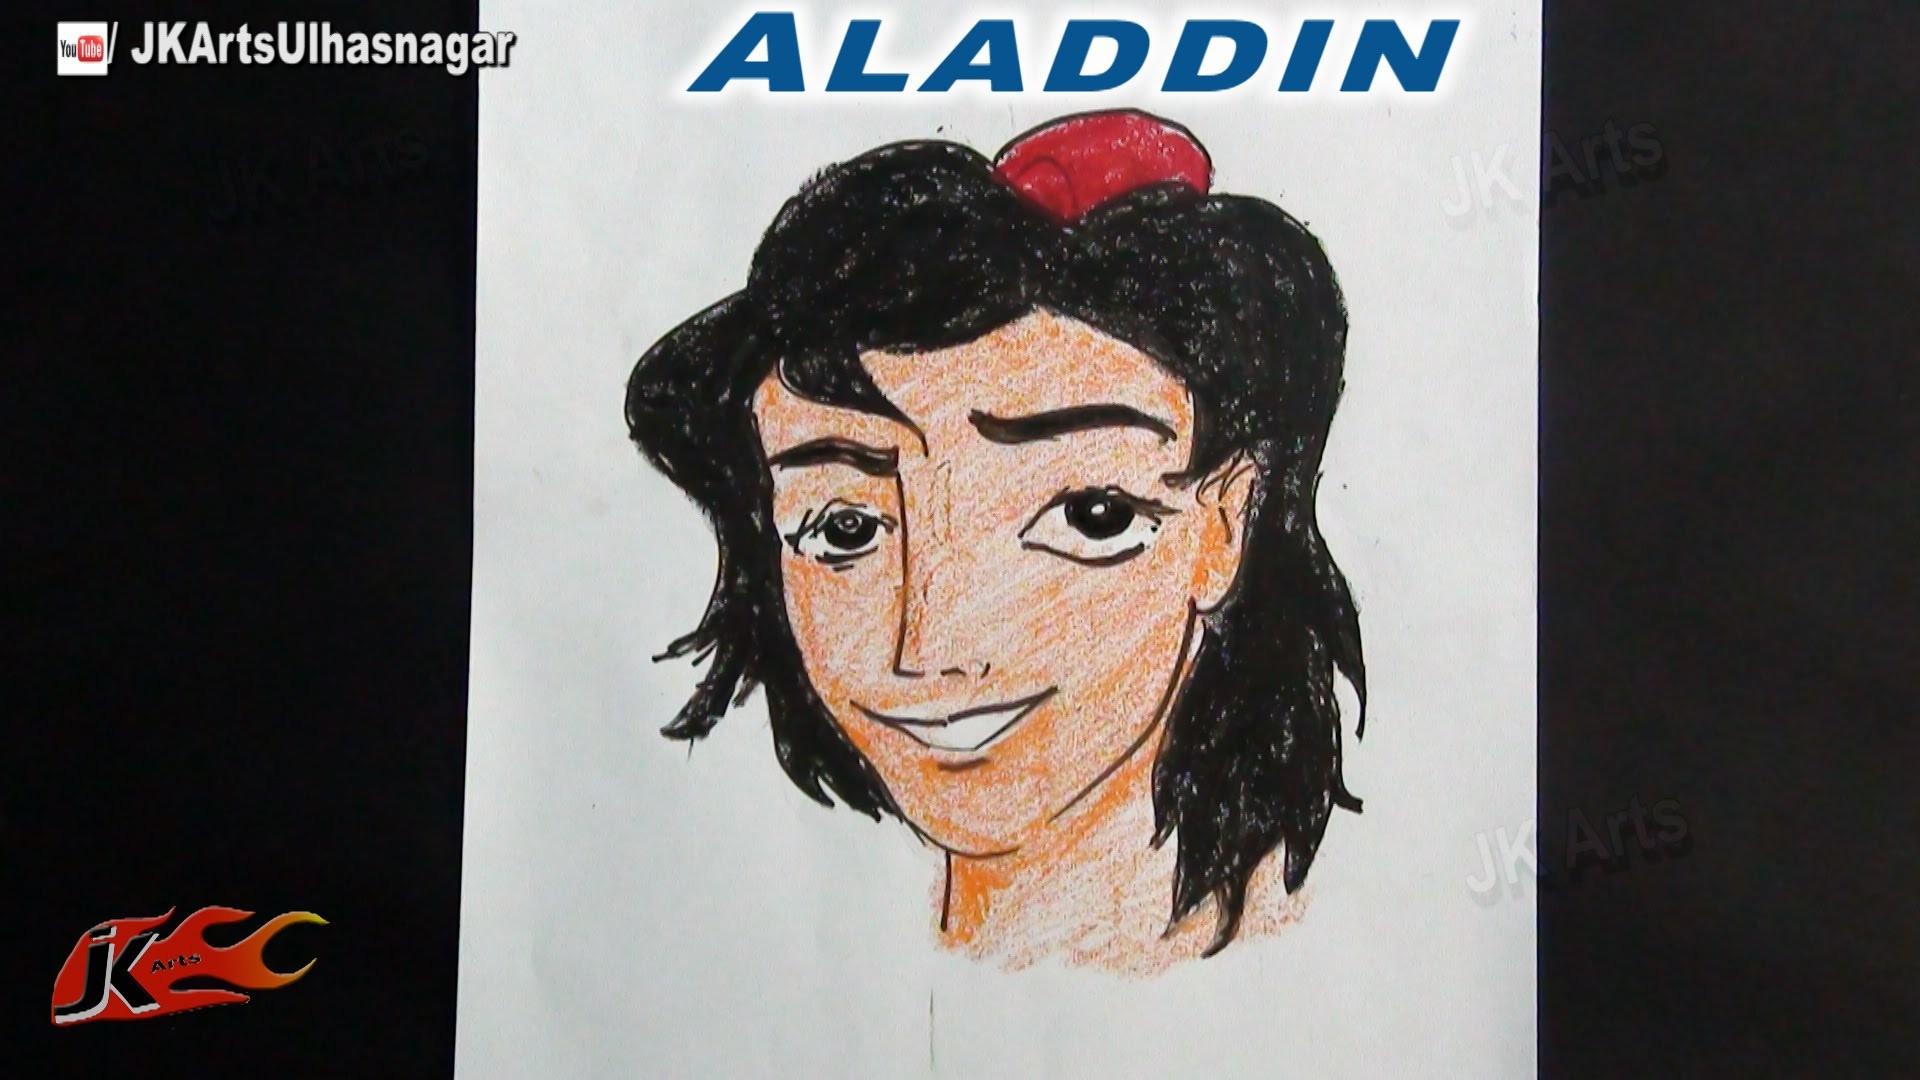 How to draw Aladdin  | JK Arts 759